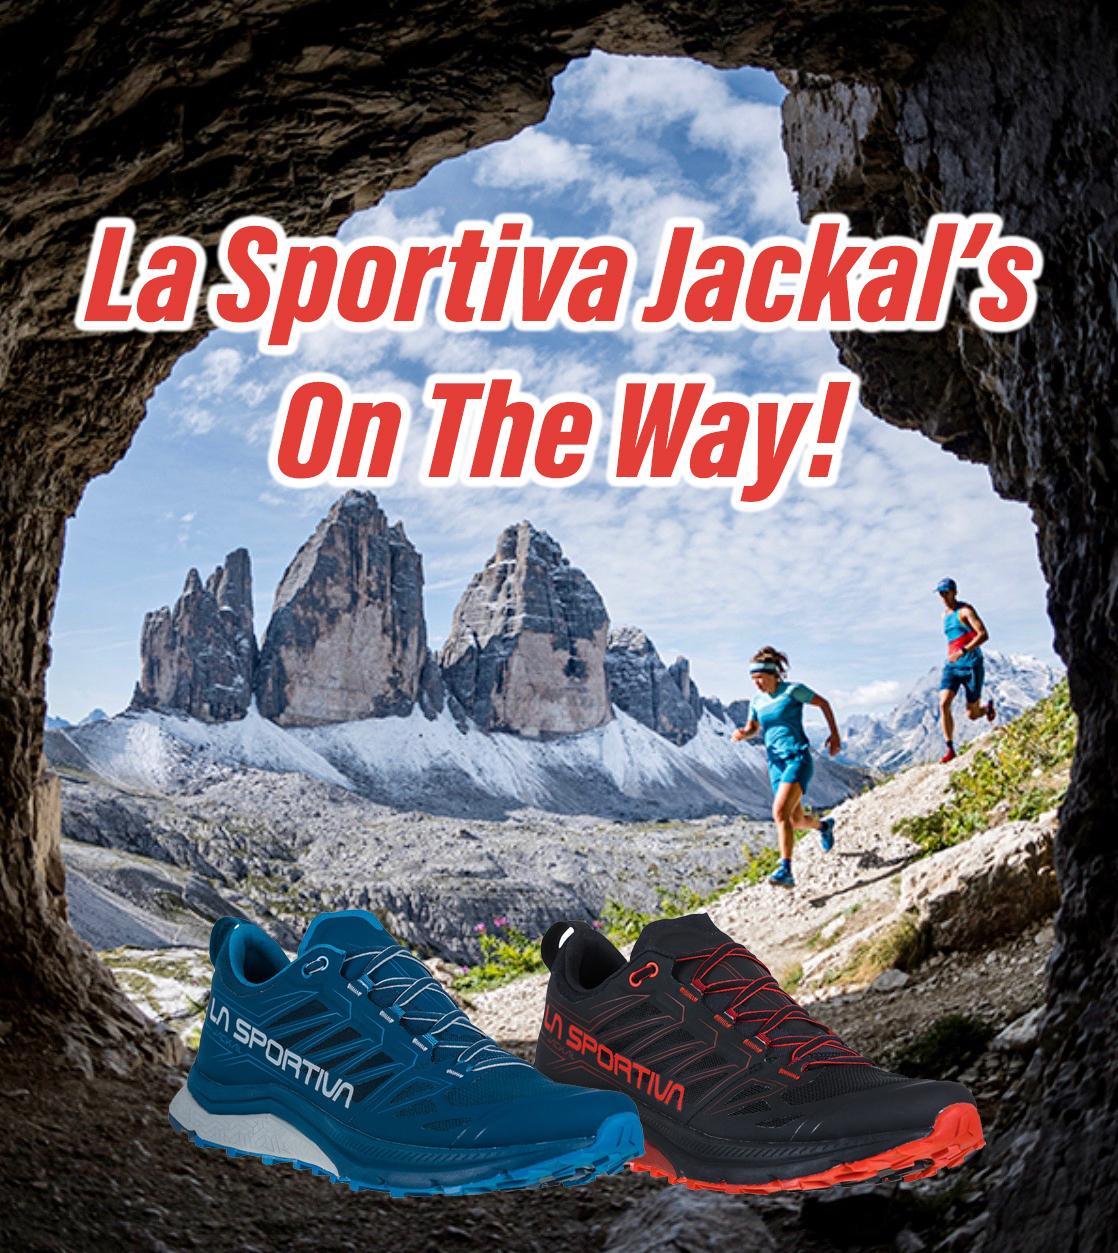 La-Sportiva-Jackal